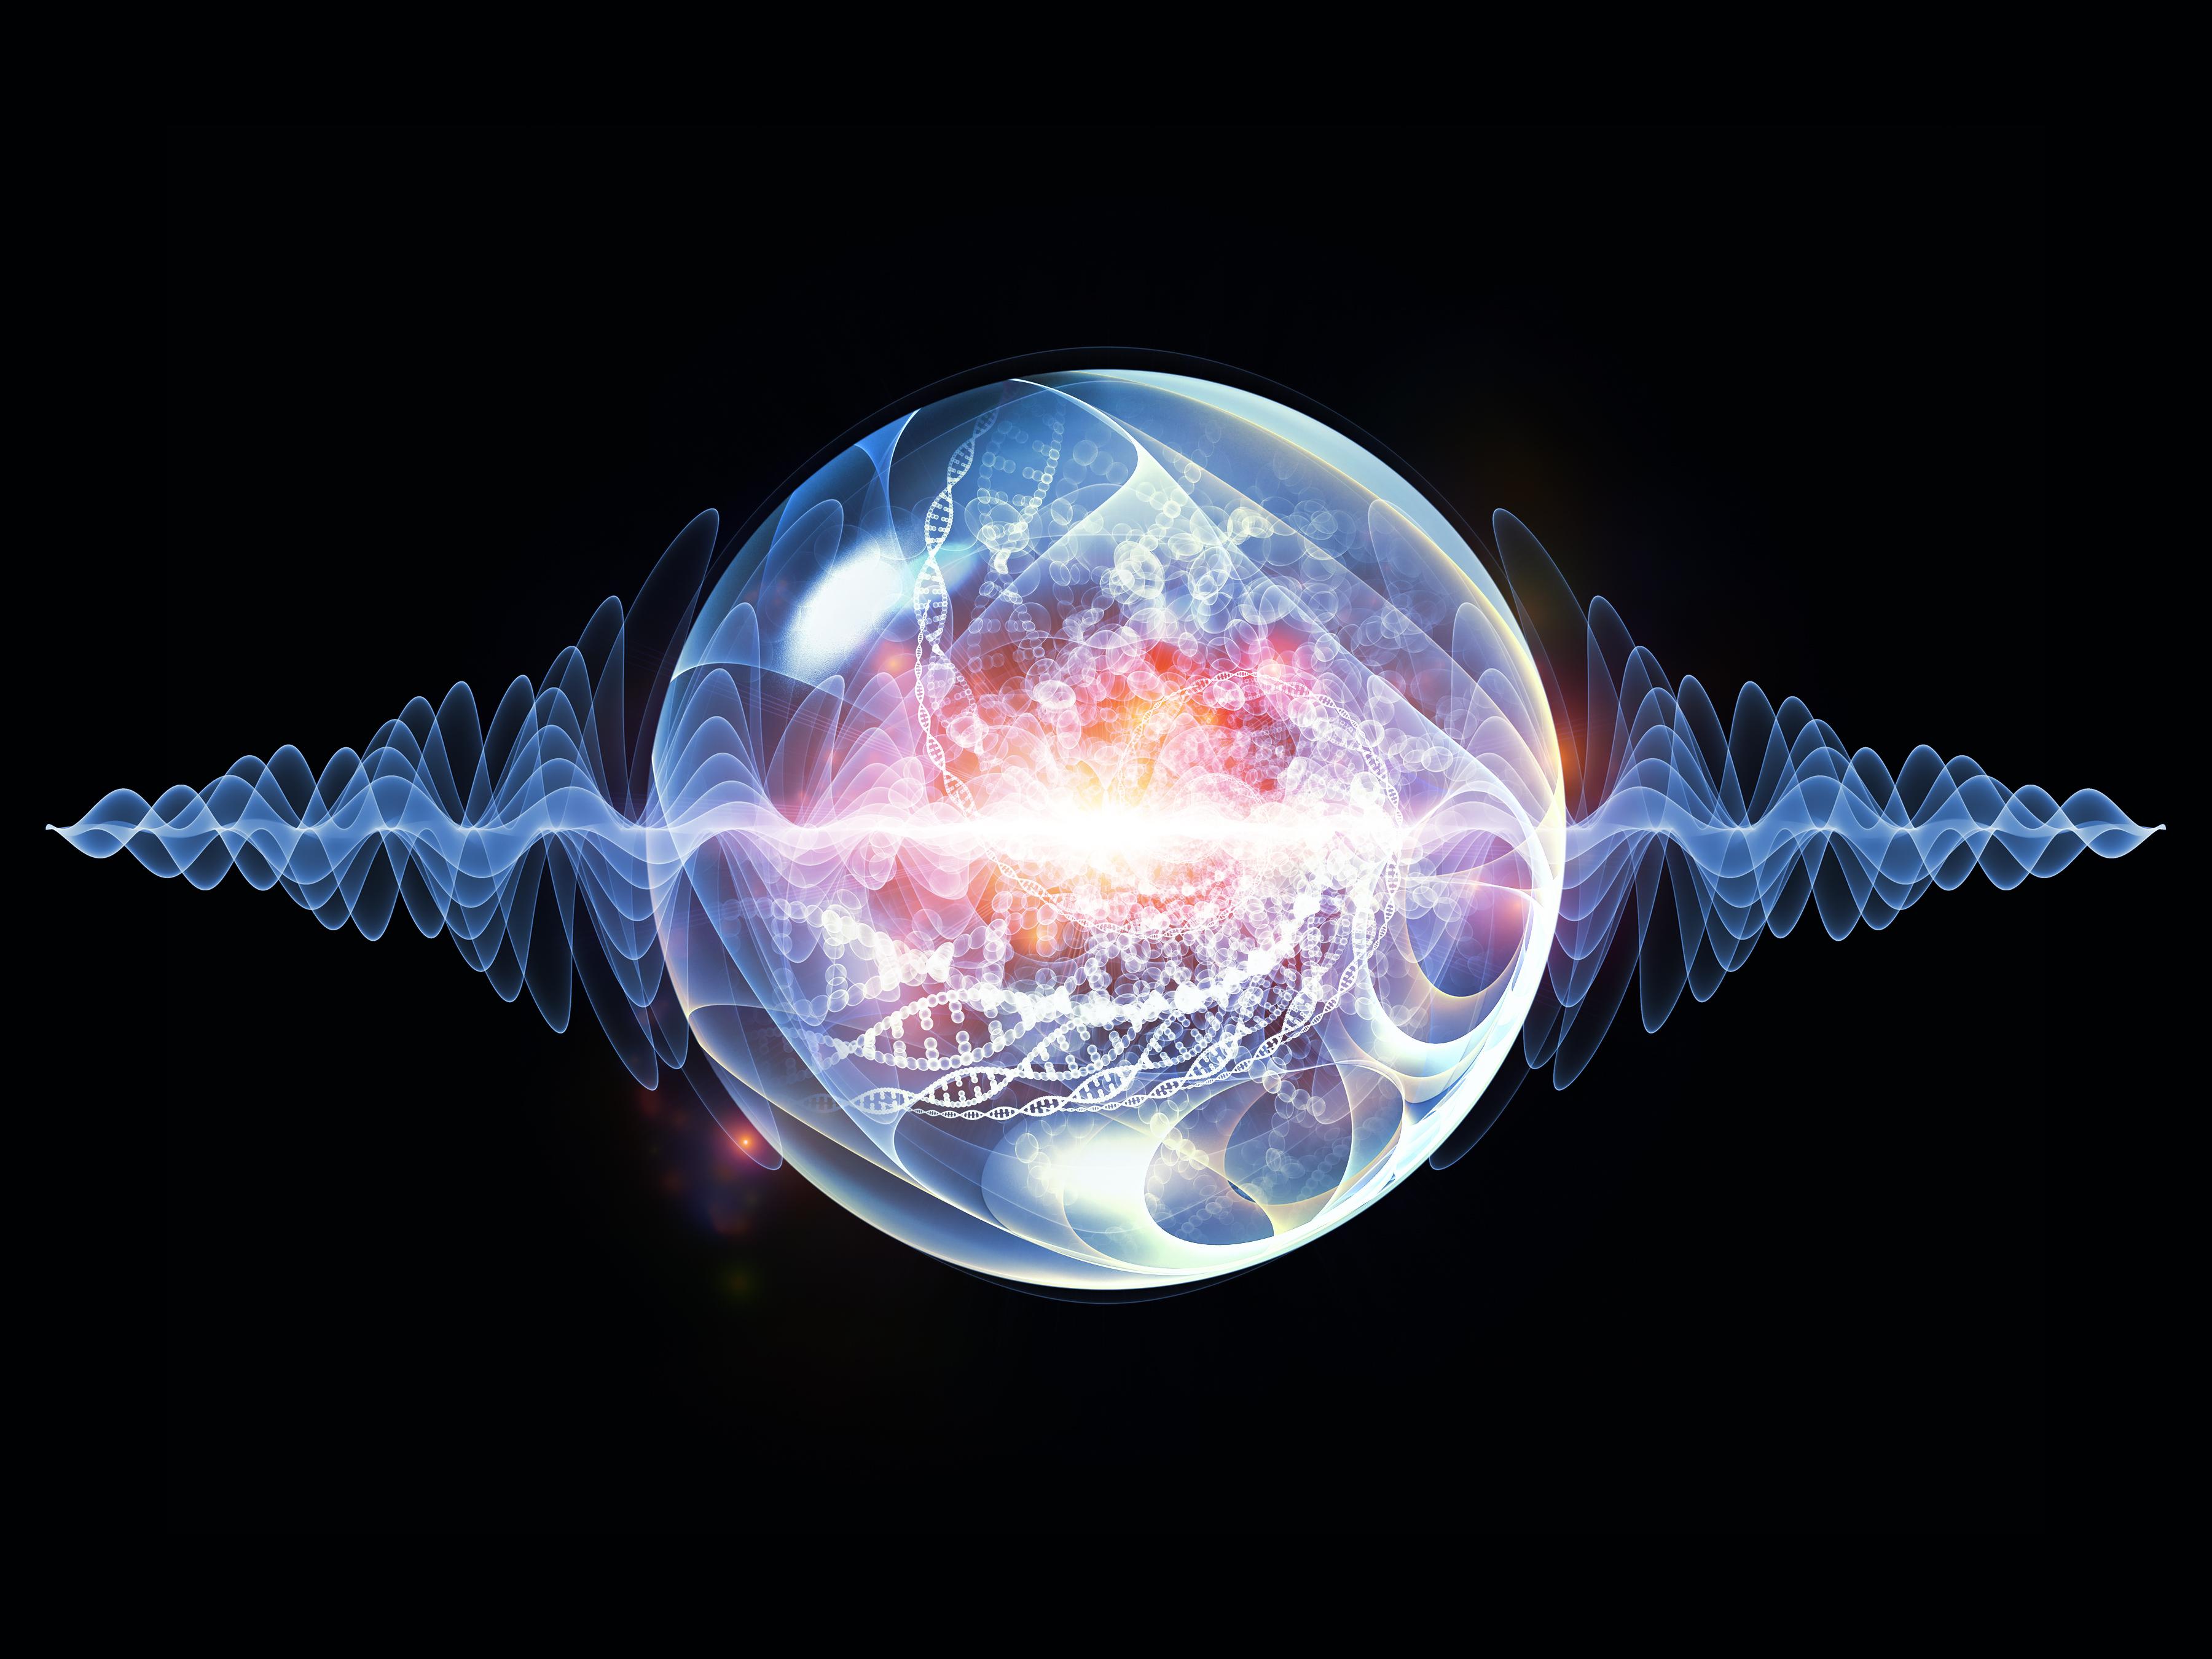 Mass Spectrometry Roundup: Mass Analyzers – Time-of-Flight (TOF)